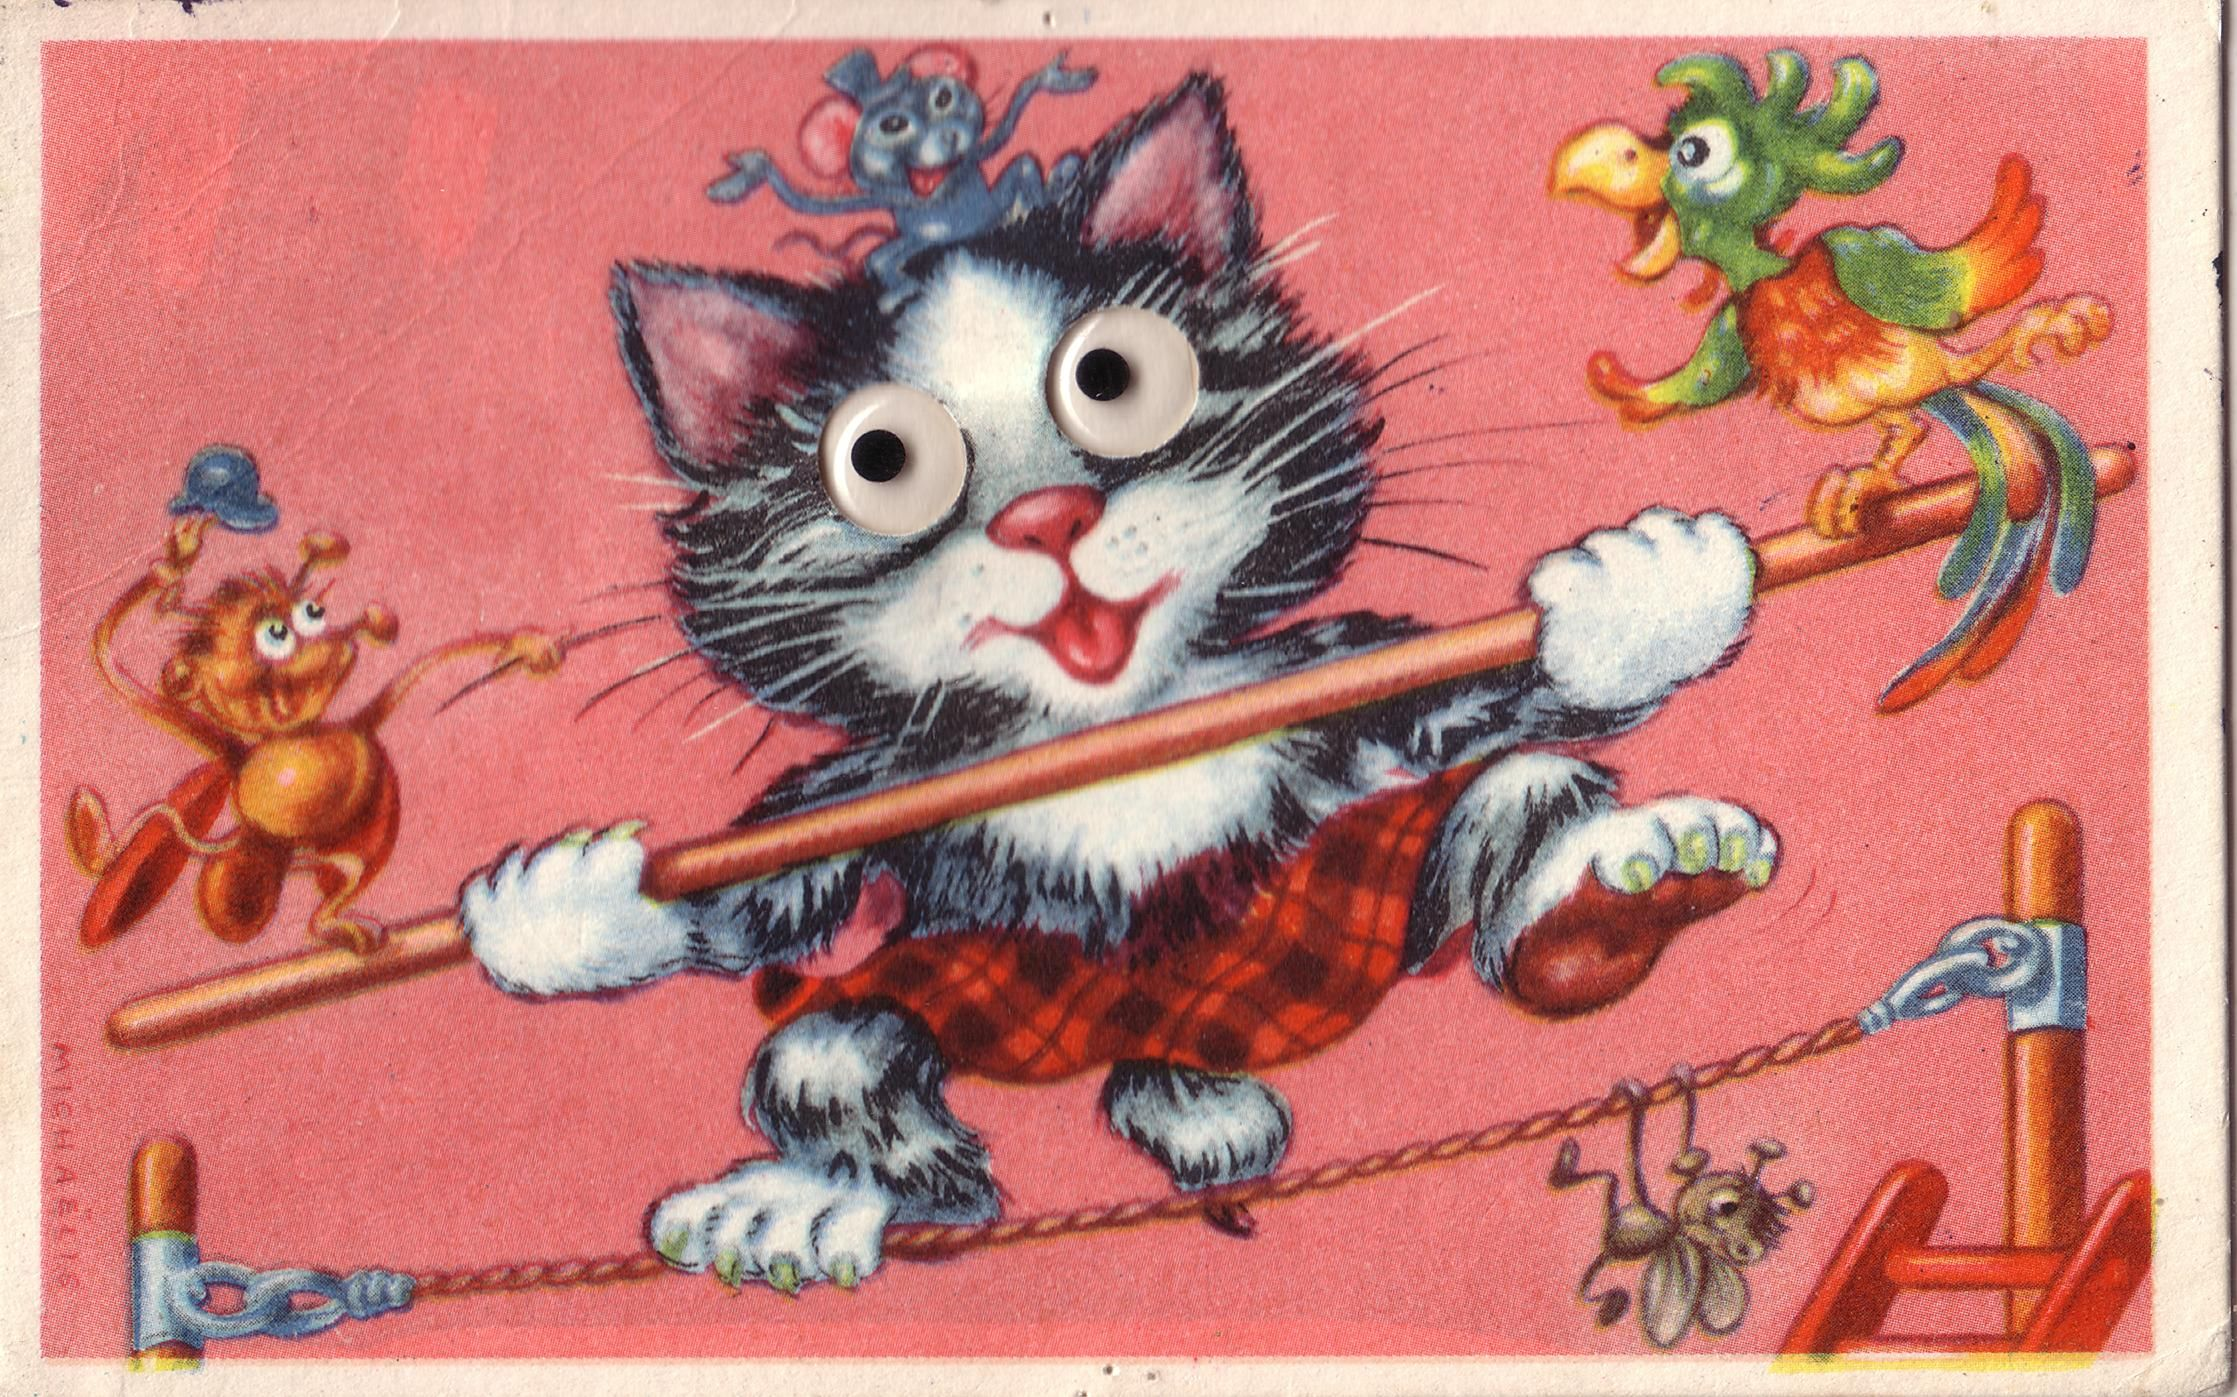 Poes Koorddanser 1963 3326098135 O Cats Kittens Cat Kitten Vintage Retro Feline Photo Art Anime Art Cats